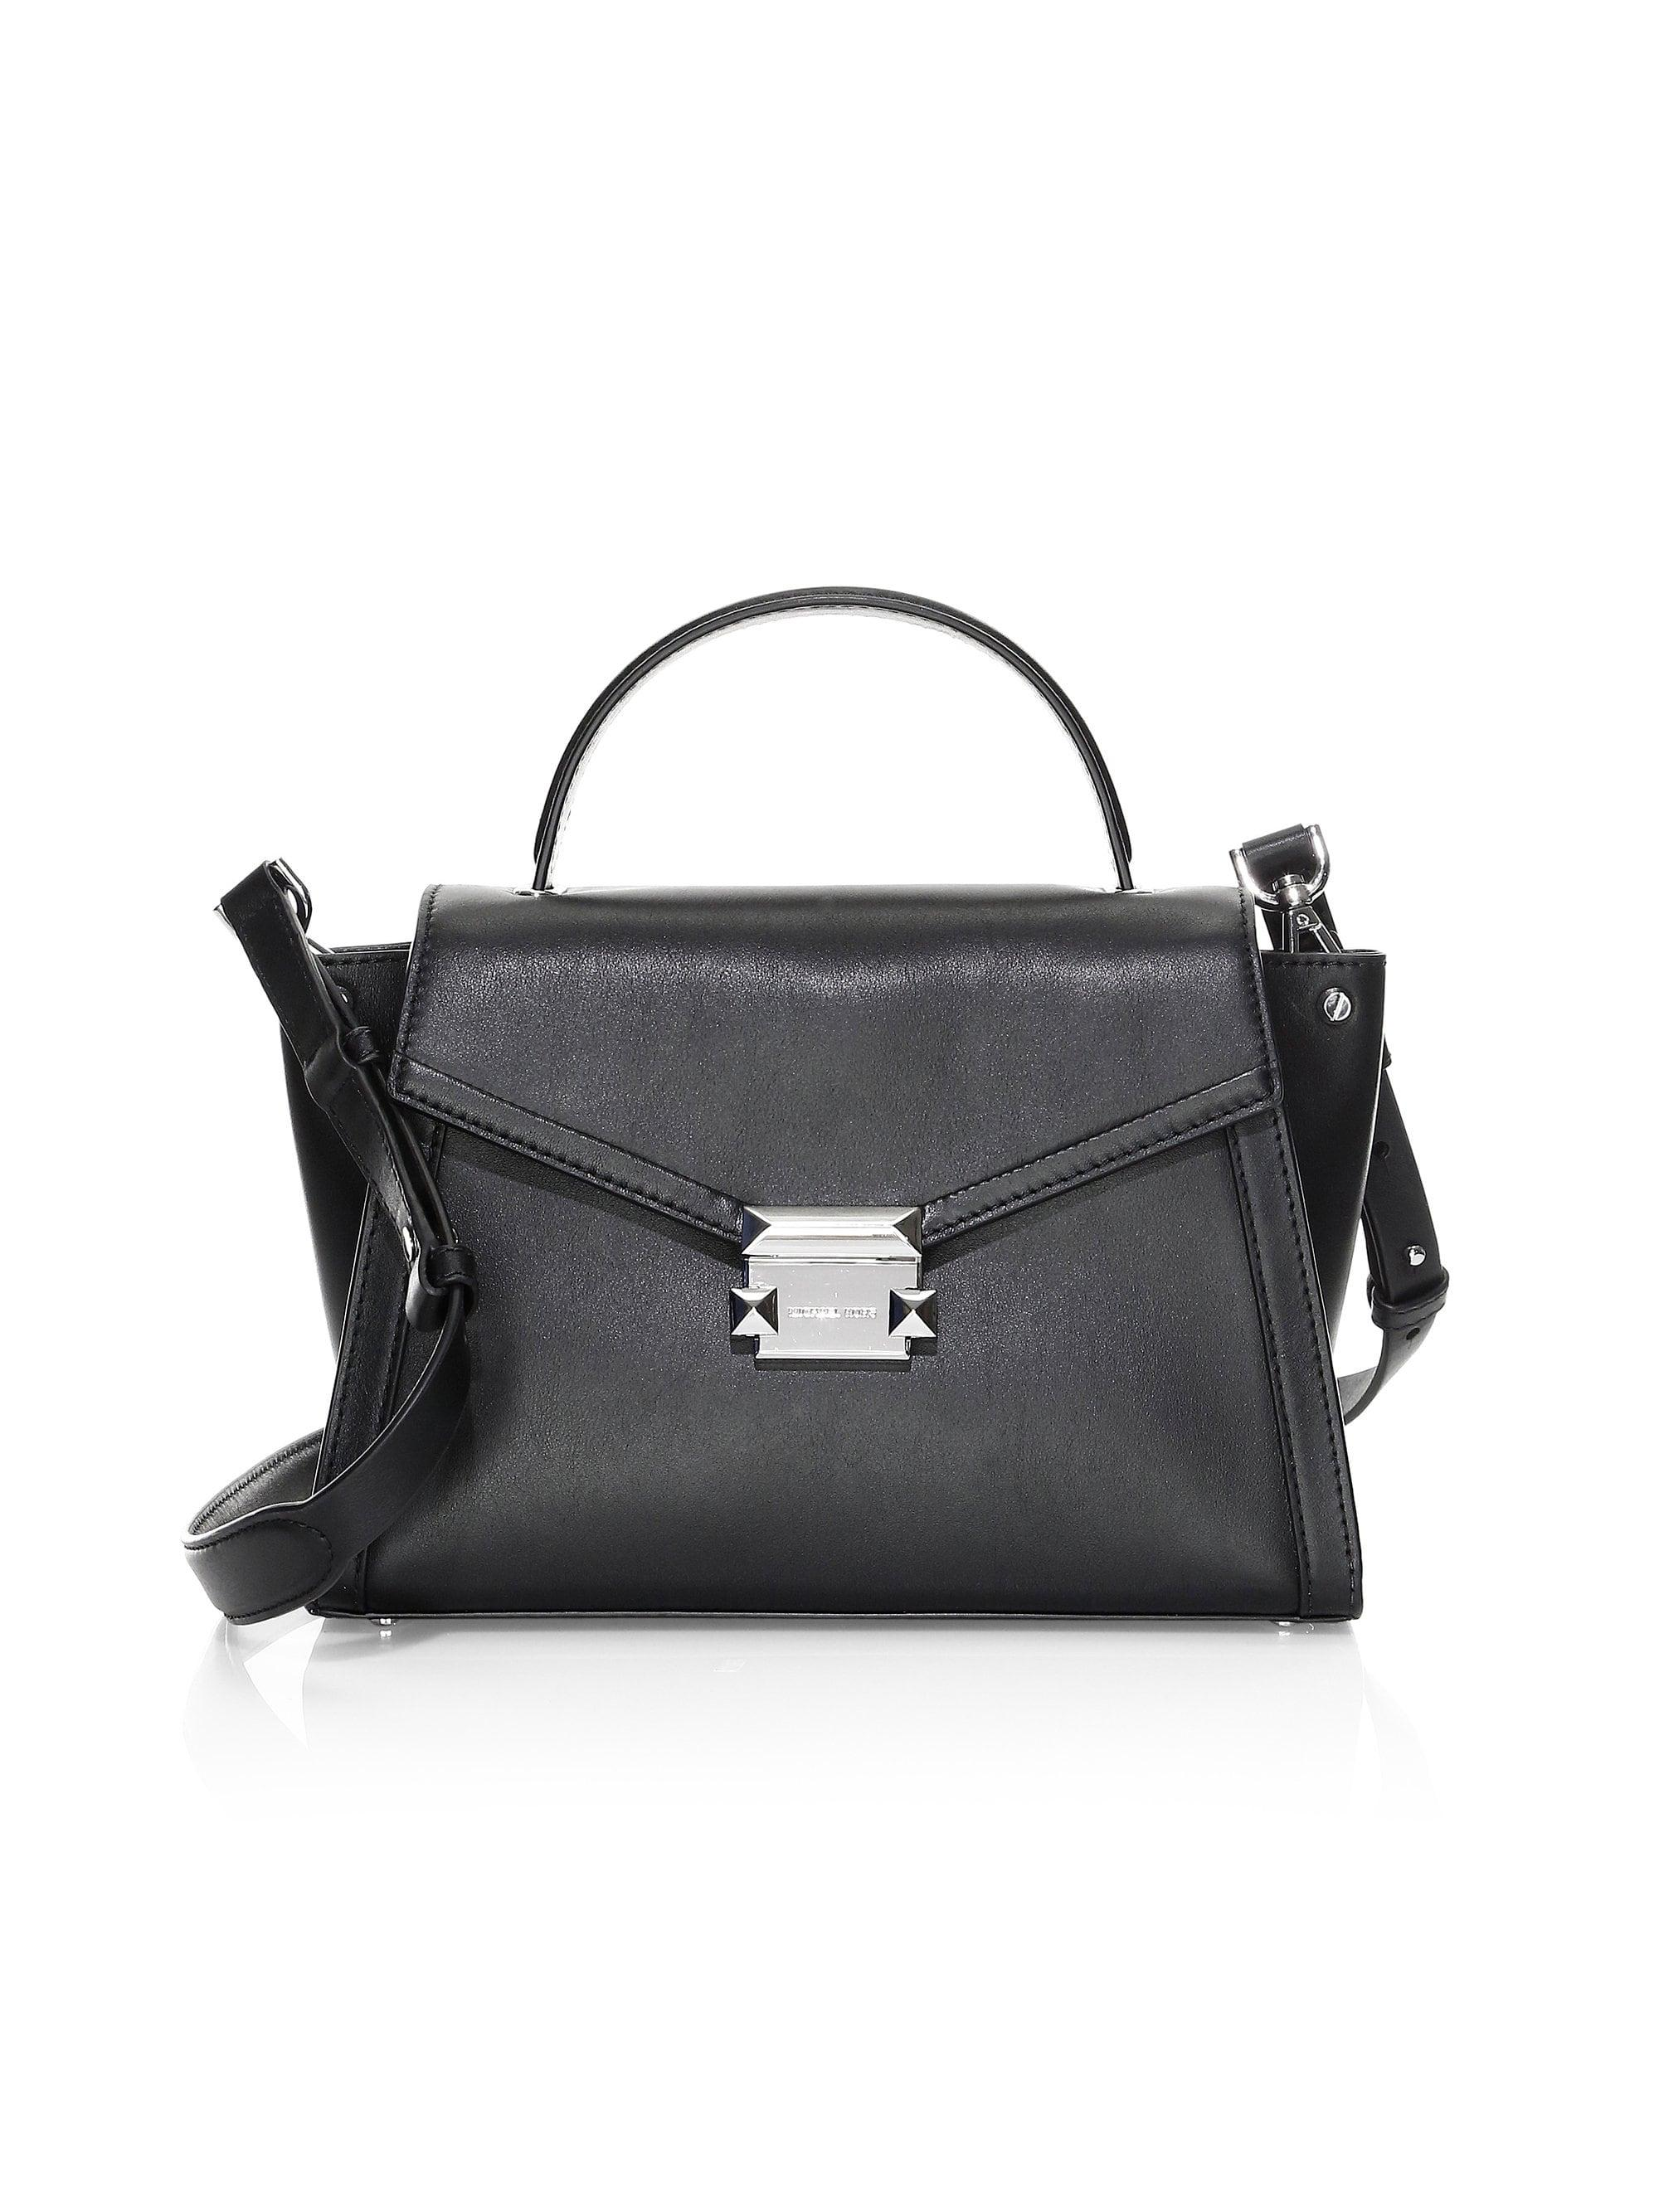 f8e54e0a13bb Lyst - MICHAEL Michael Kors Women's Medium Whitney Leather Satchel ...